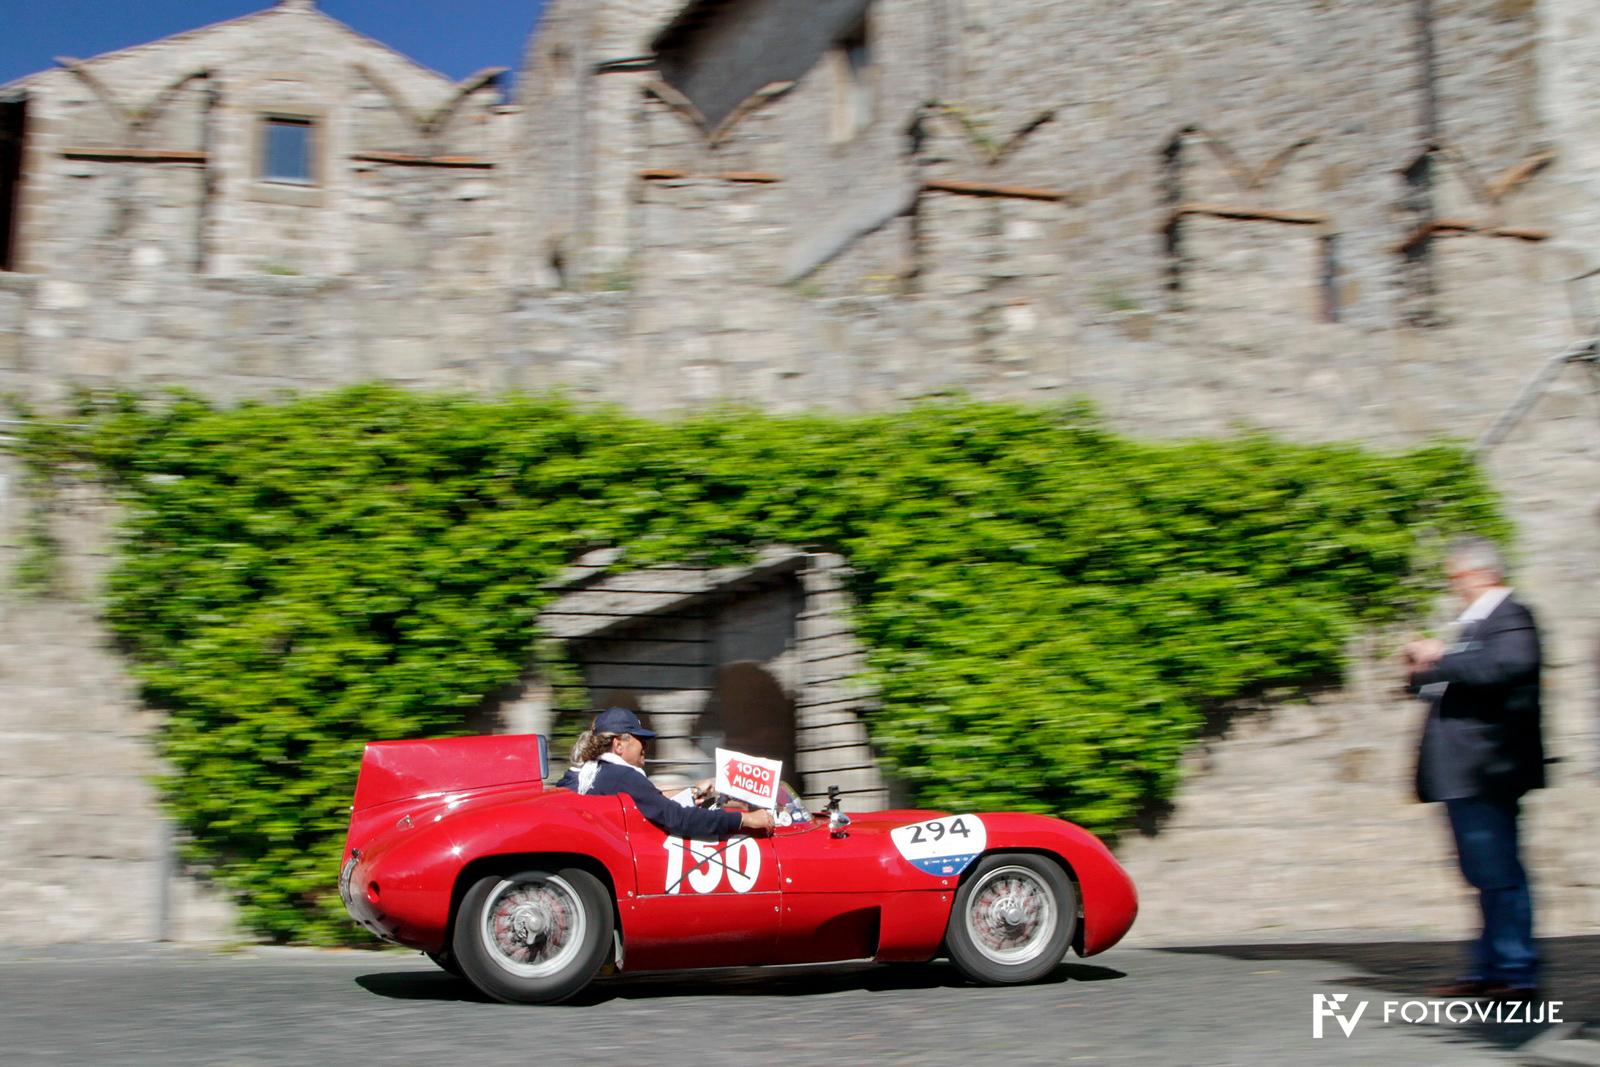 Mille Miglia 2018: Dirkalna O.S.C.A MT4 1100 2AD Valentini pred obzidjem